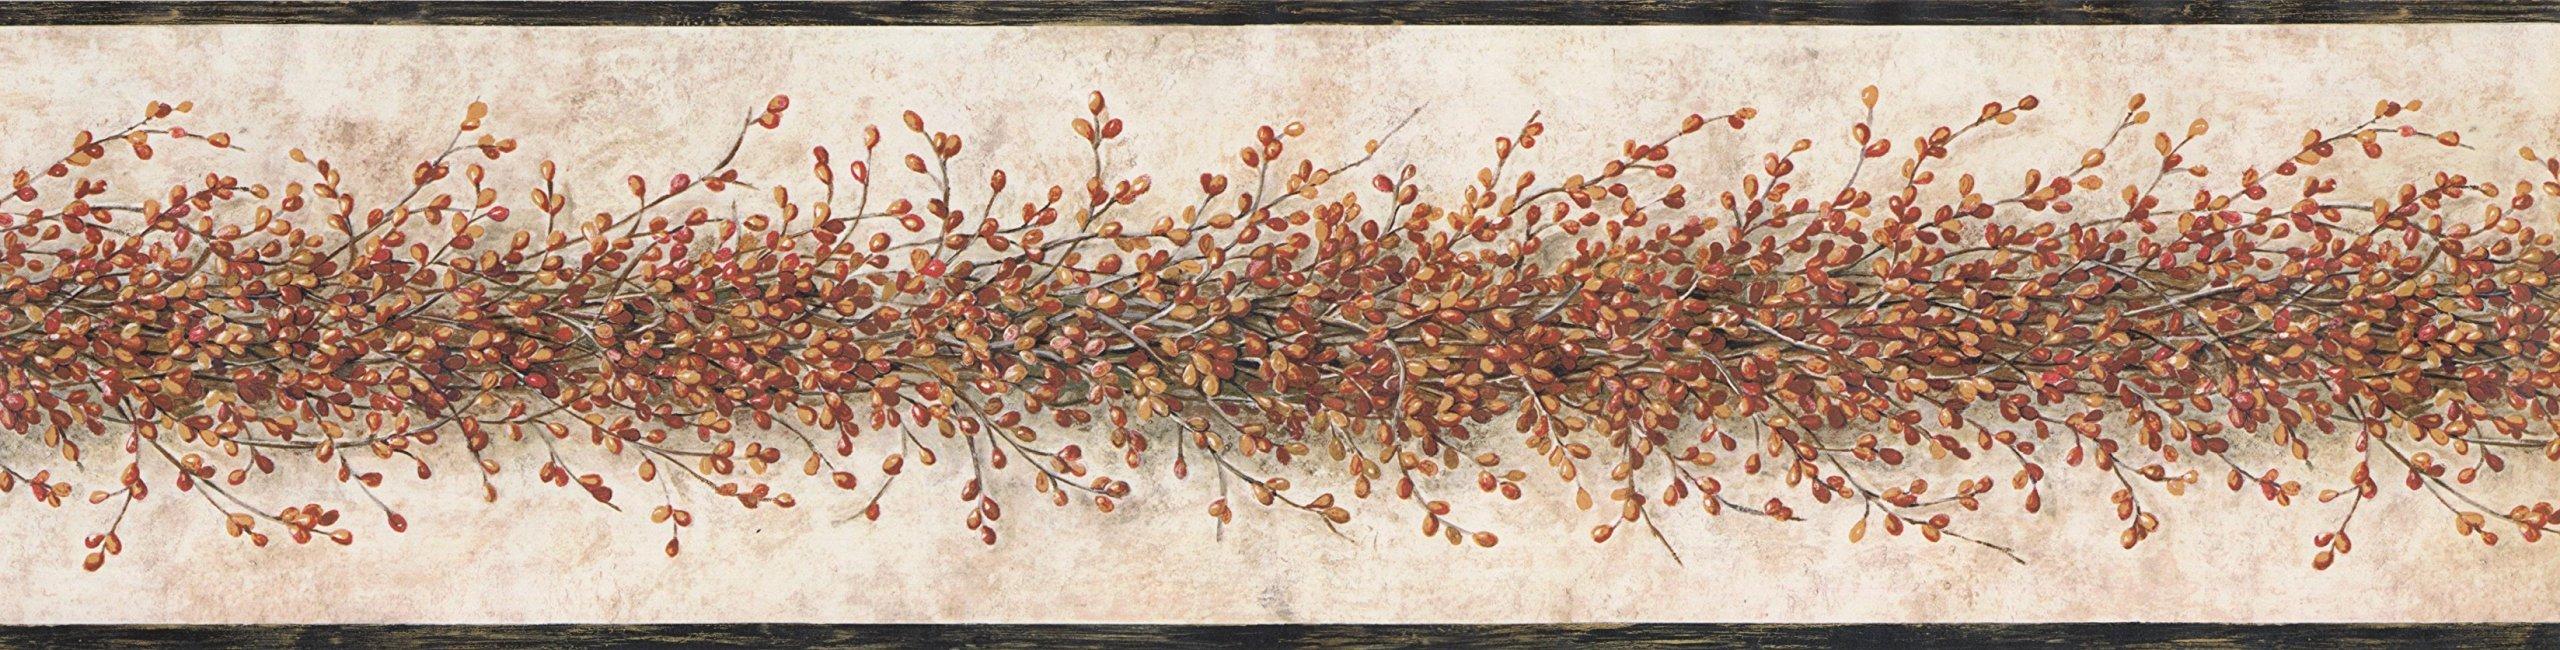 Wallpaper Border - Floral Wallpaper Border 3348 YC